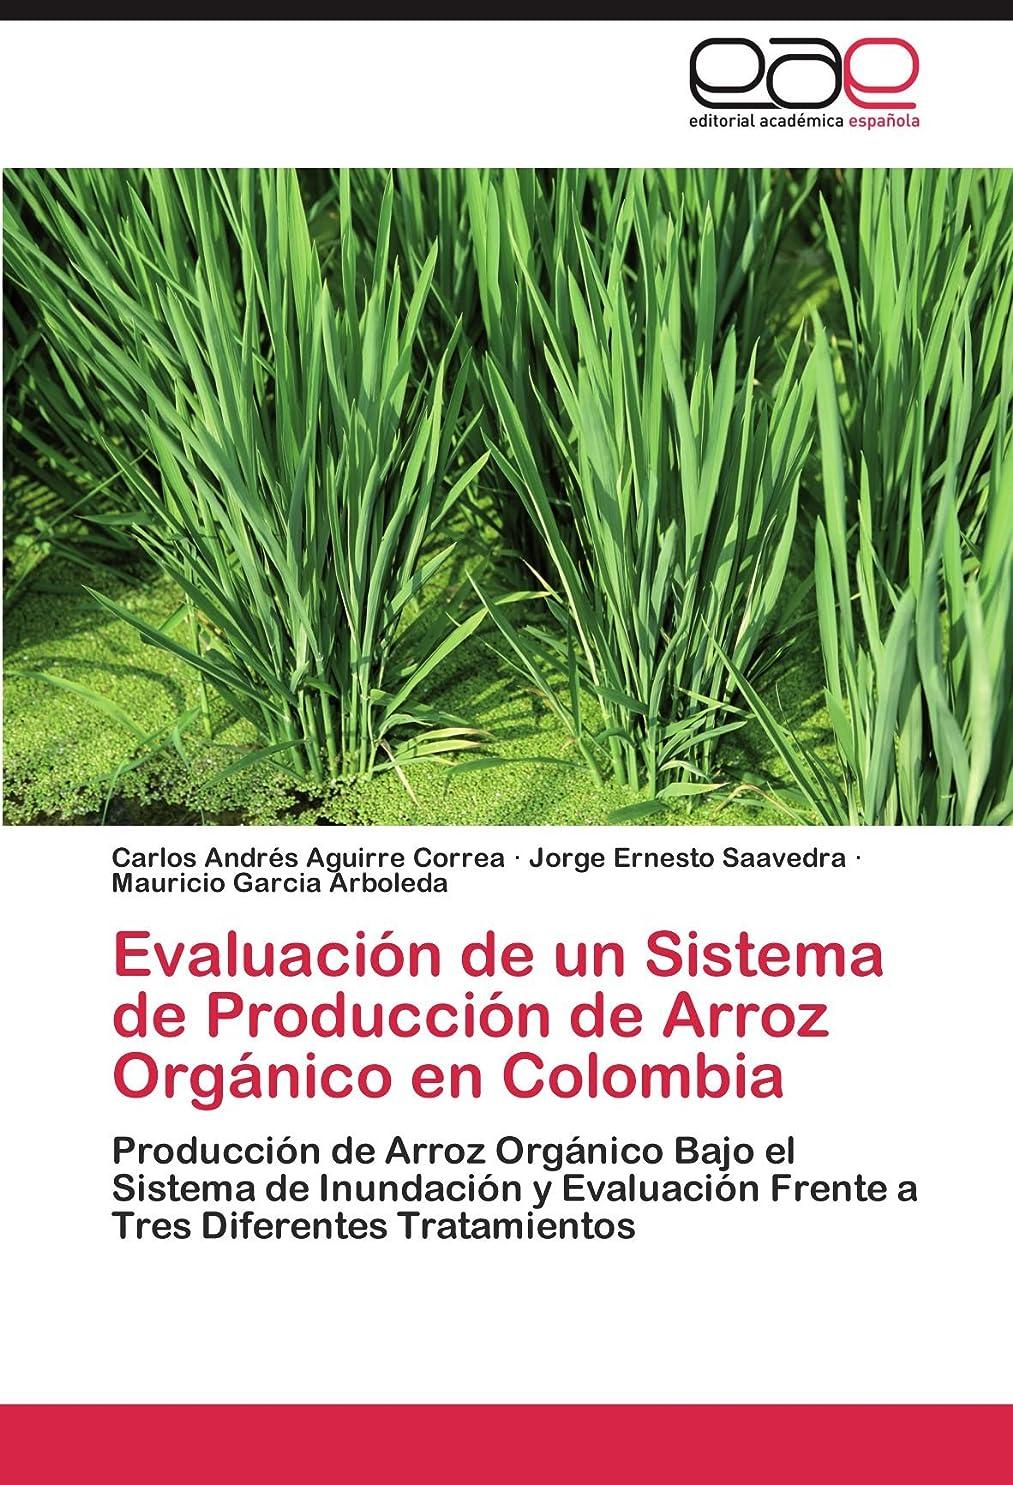 リーレシピマエストロEvaluacion de Un Sistema de Produccion de Arroz Organico En Colombia